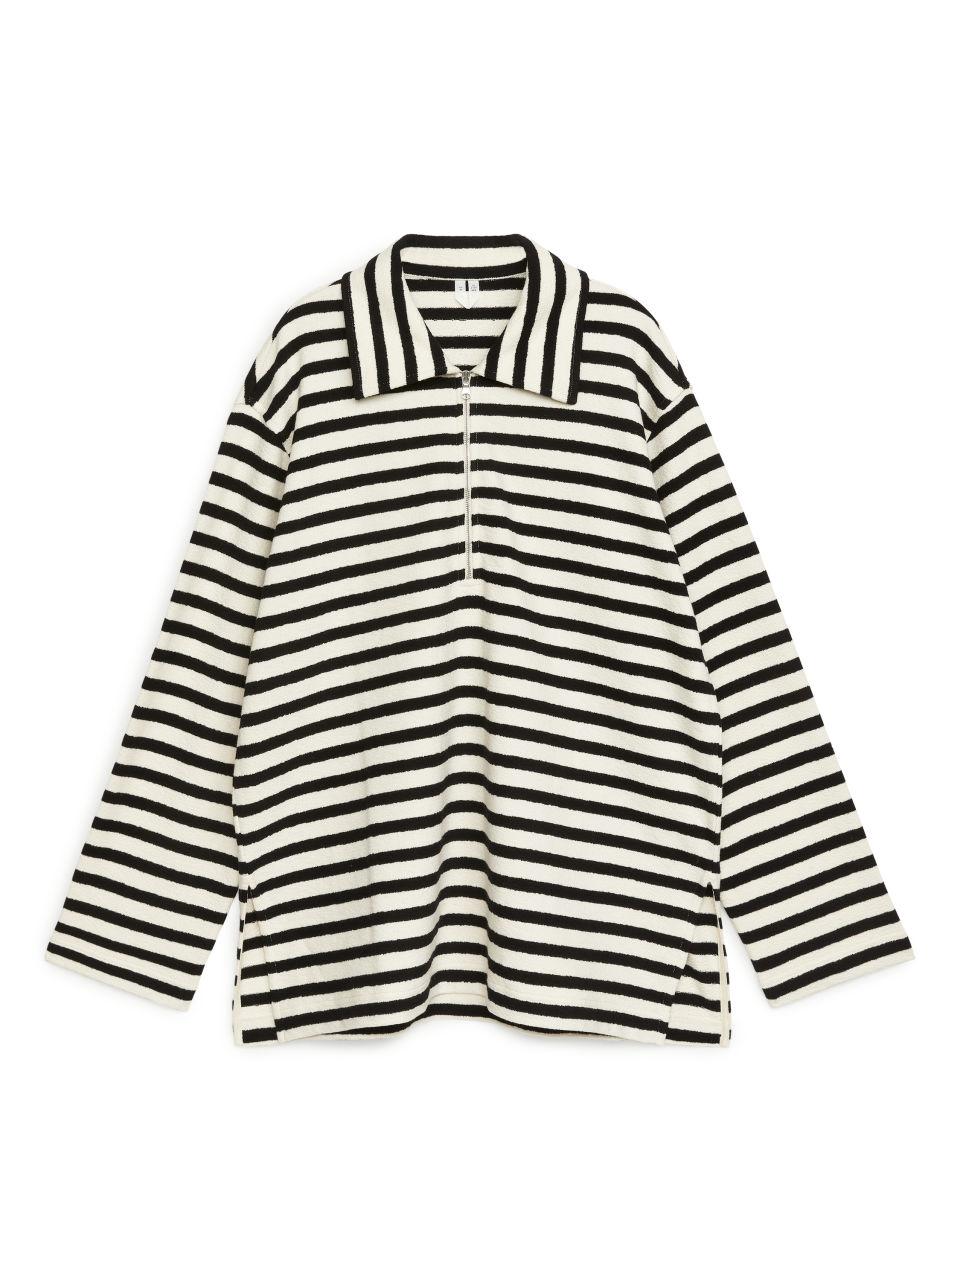 Jersey Polo Shirt - White